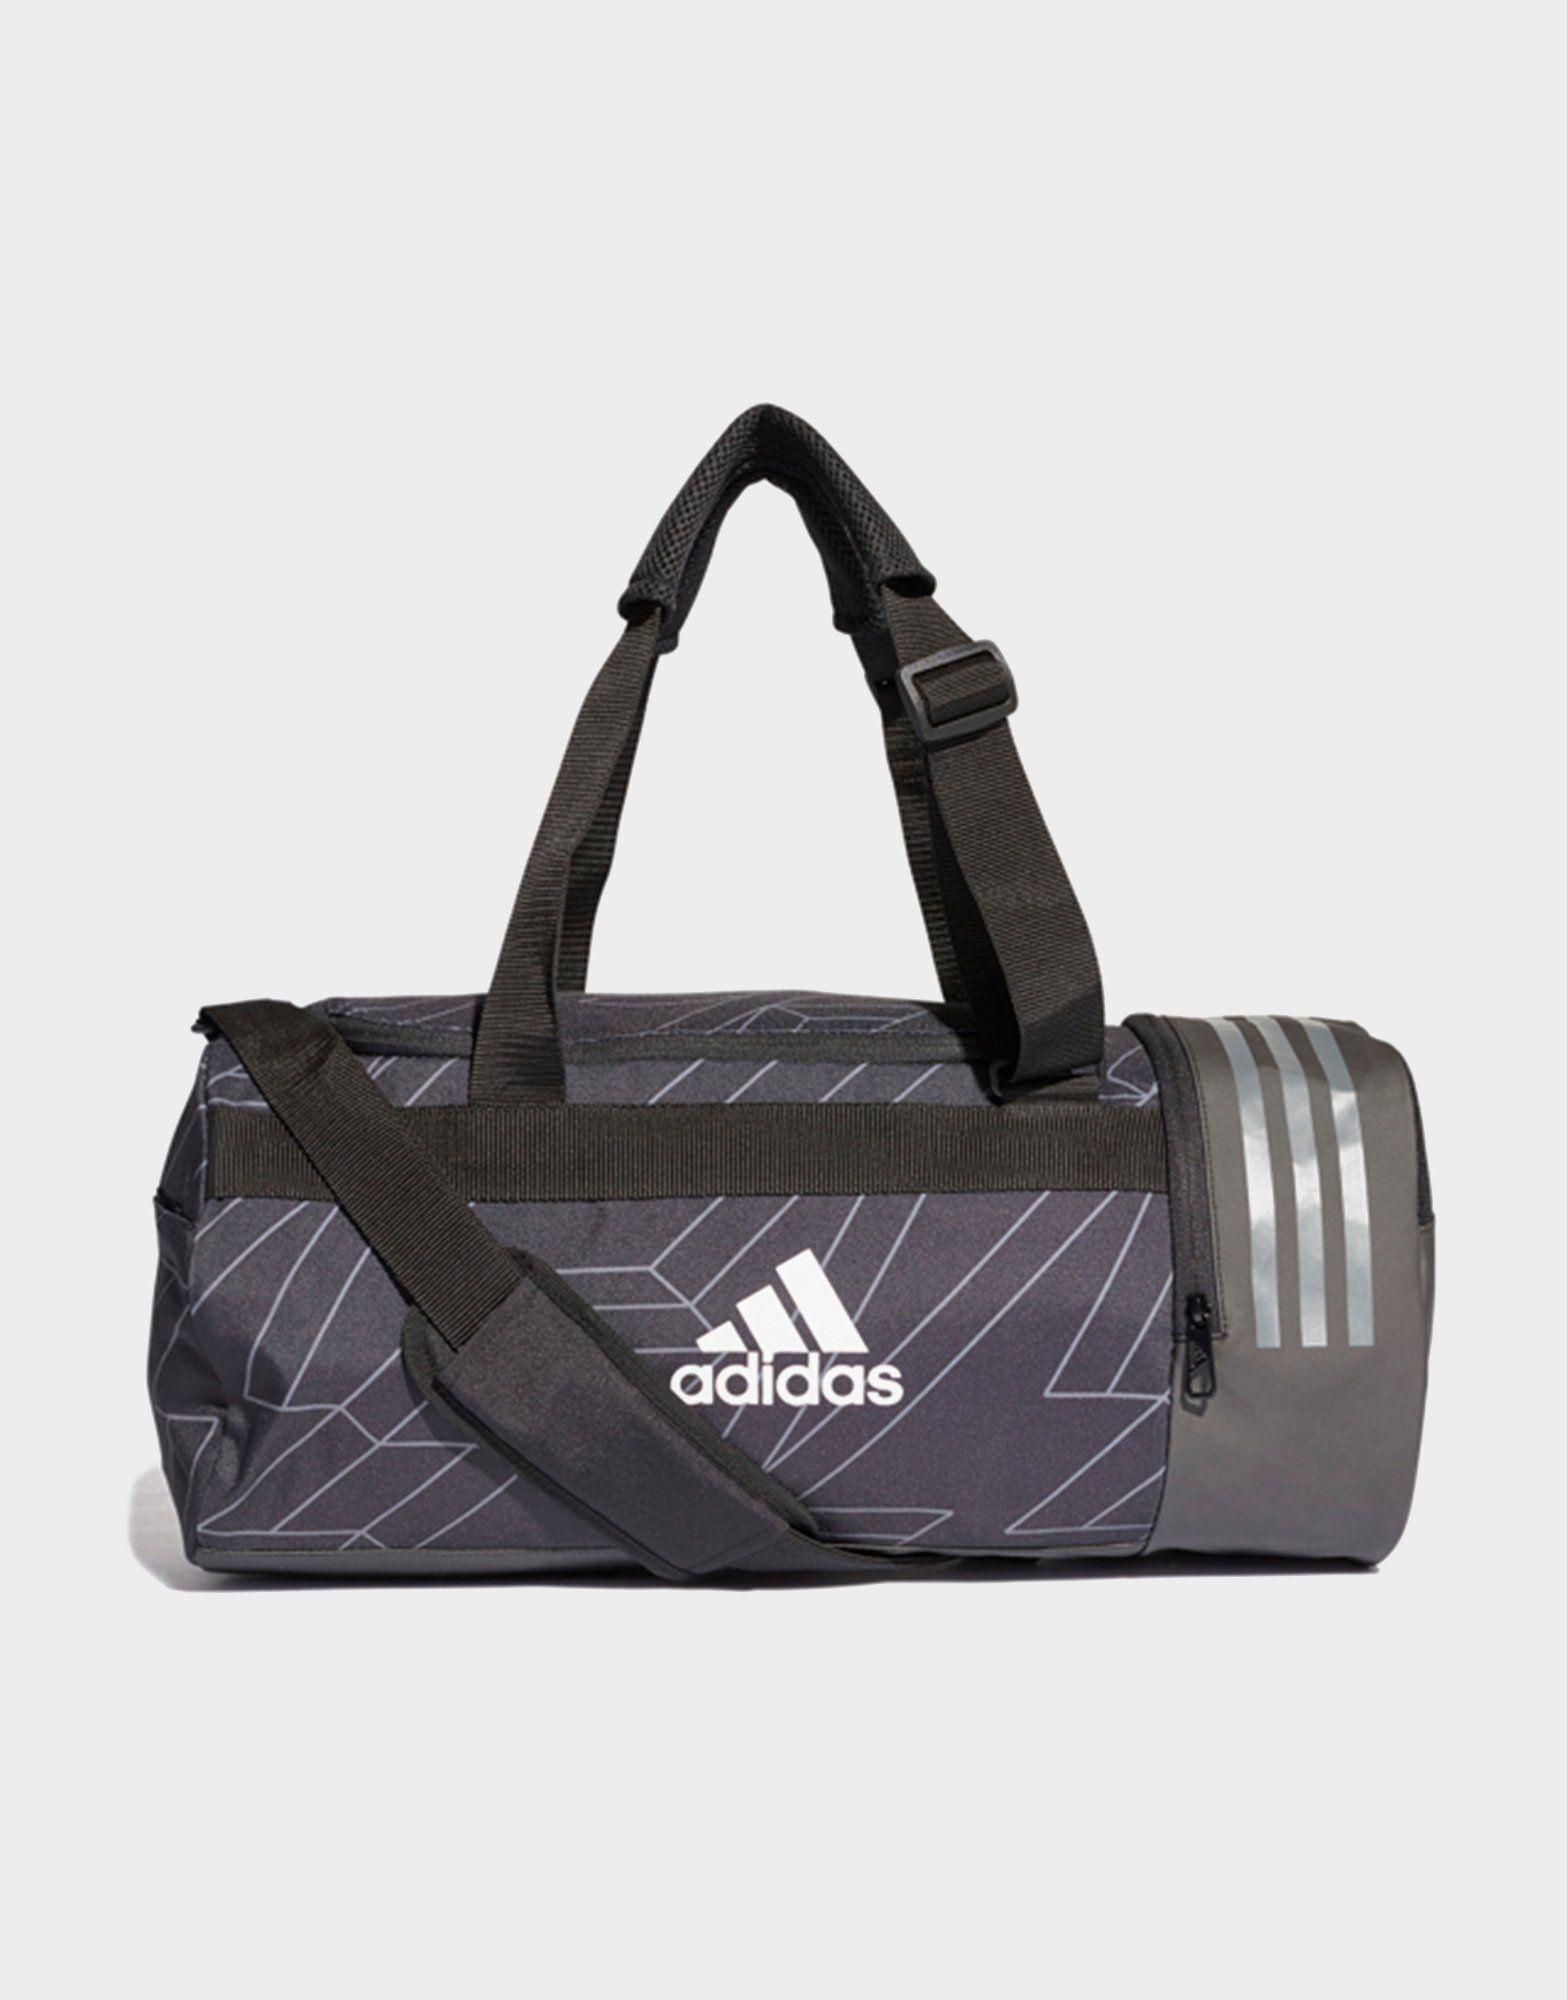 17e87c076d Sports Direct Adidas Gym Bag- Fenix Toulouse Handball